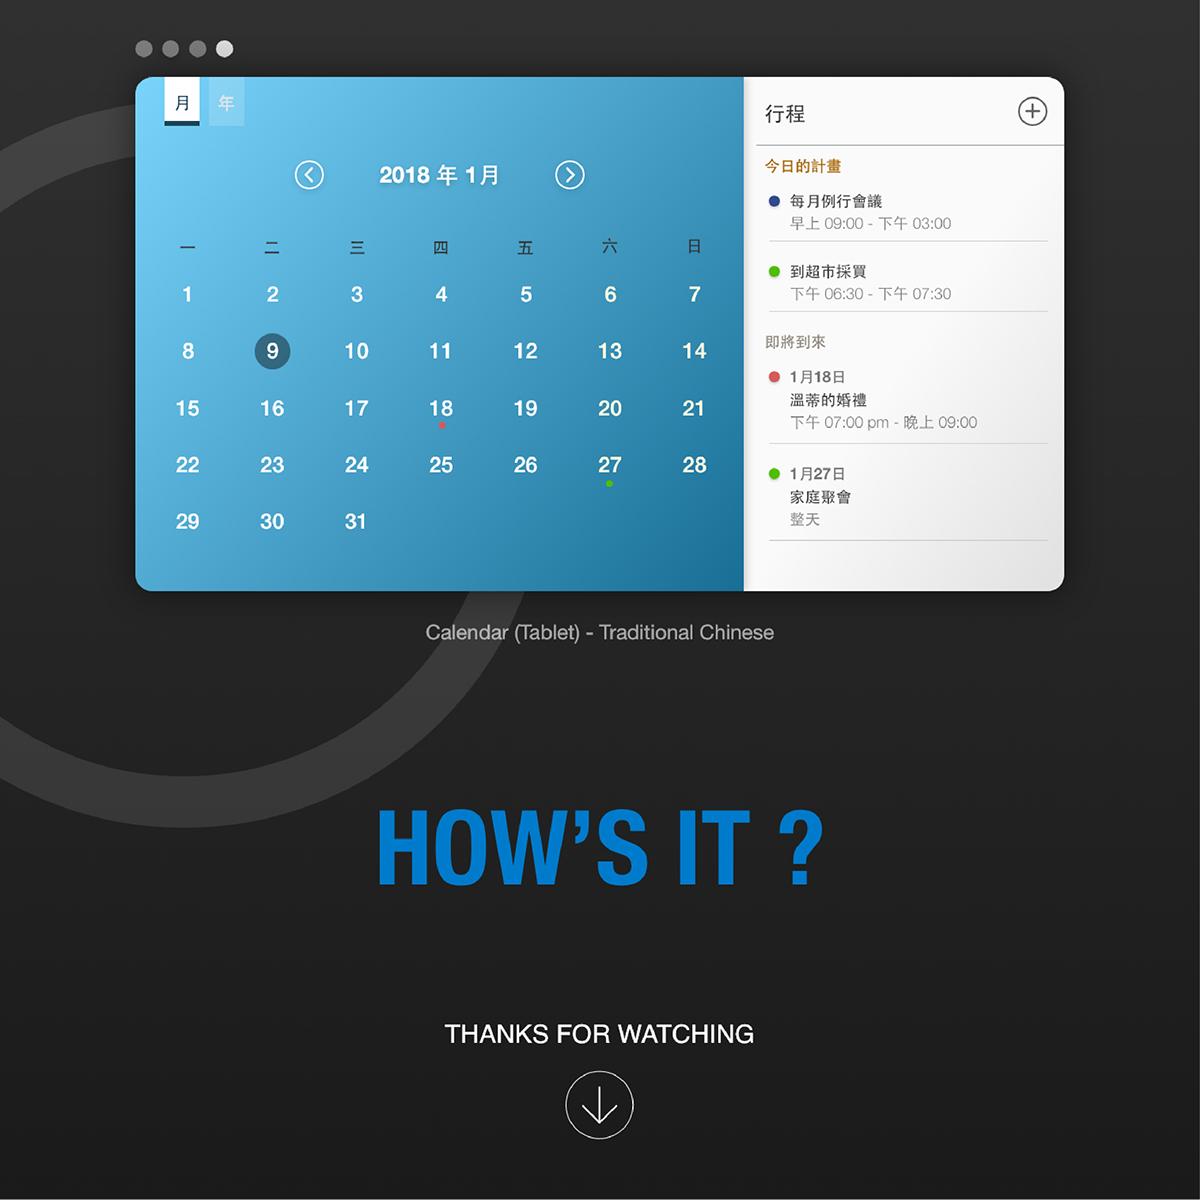 'Calendar Ui Models In Adobe Xd' By Jasper Yeh On Behance intended for Adobe Xd Calendar